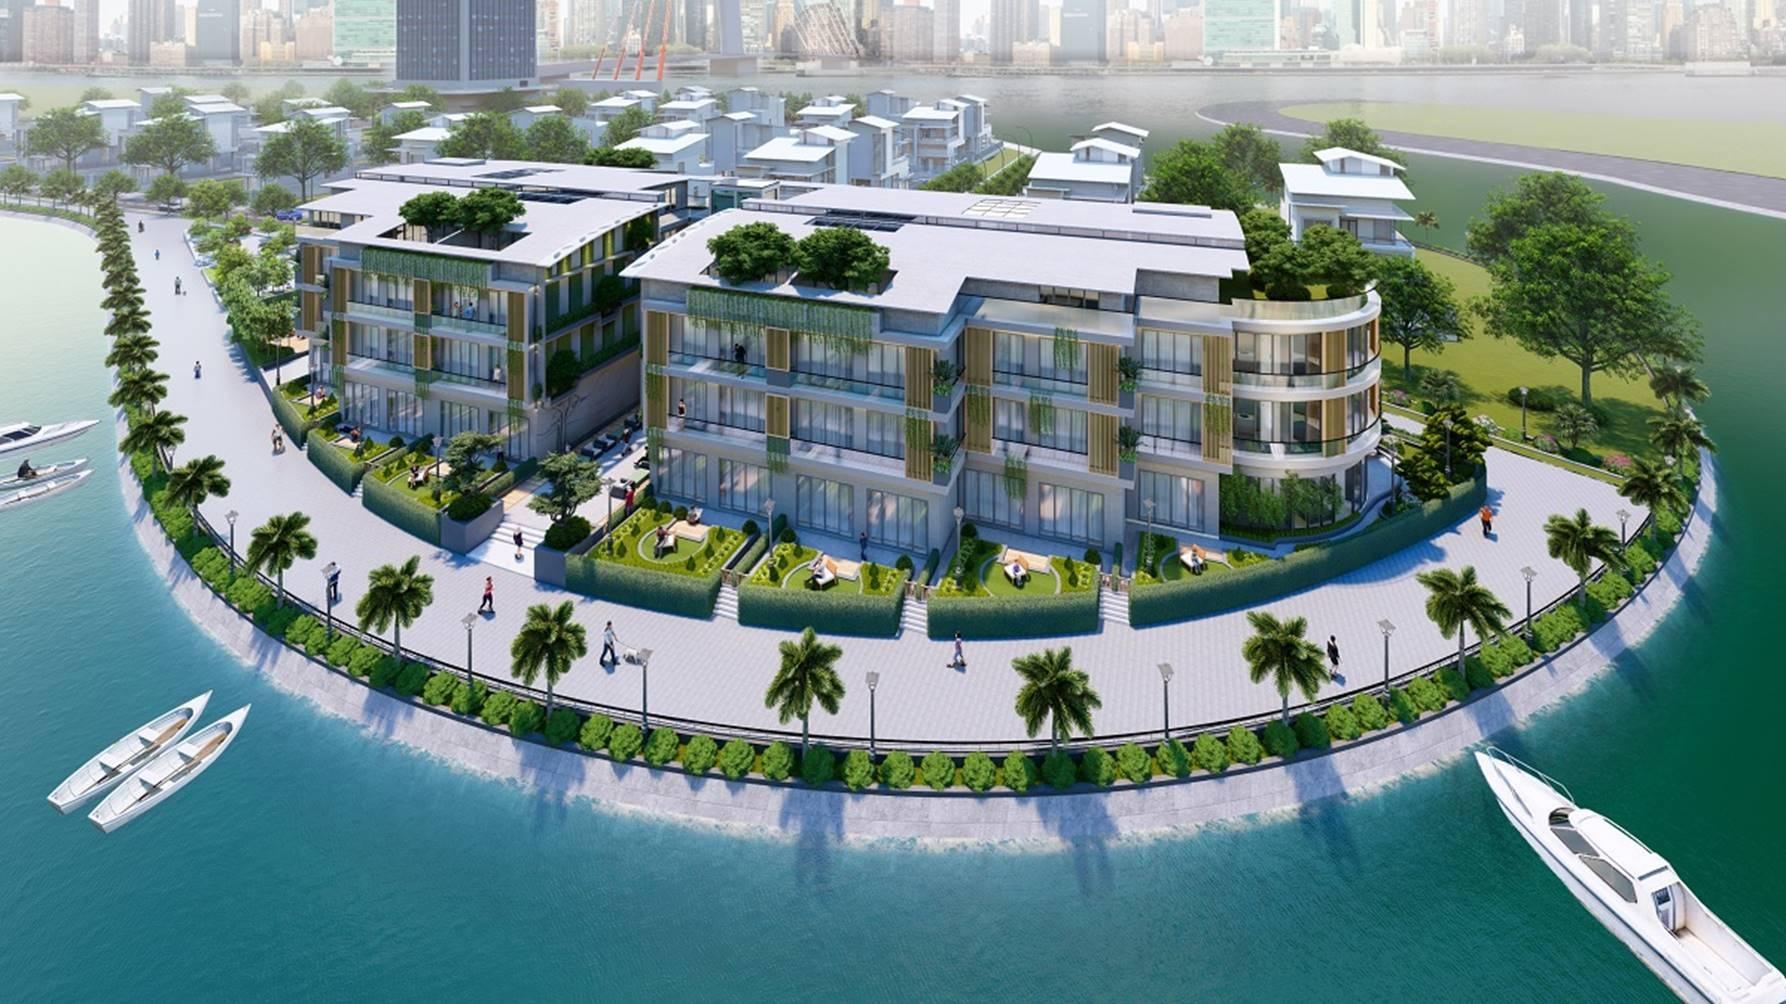 linkhouse mien trung phan hoi thong tin ve viec dieu tra du an dao xanh sky villas